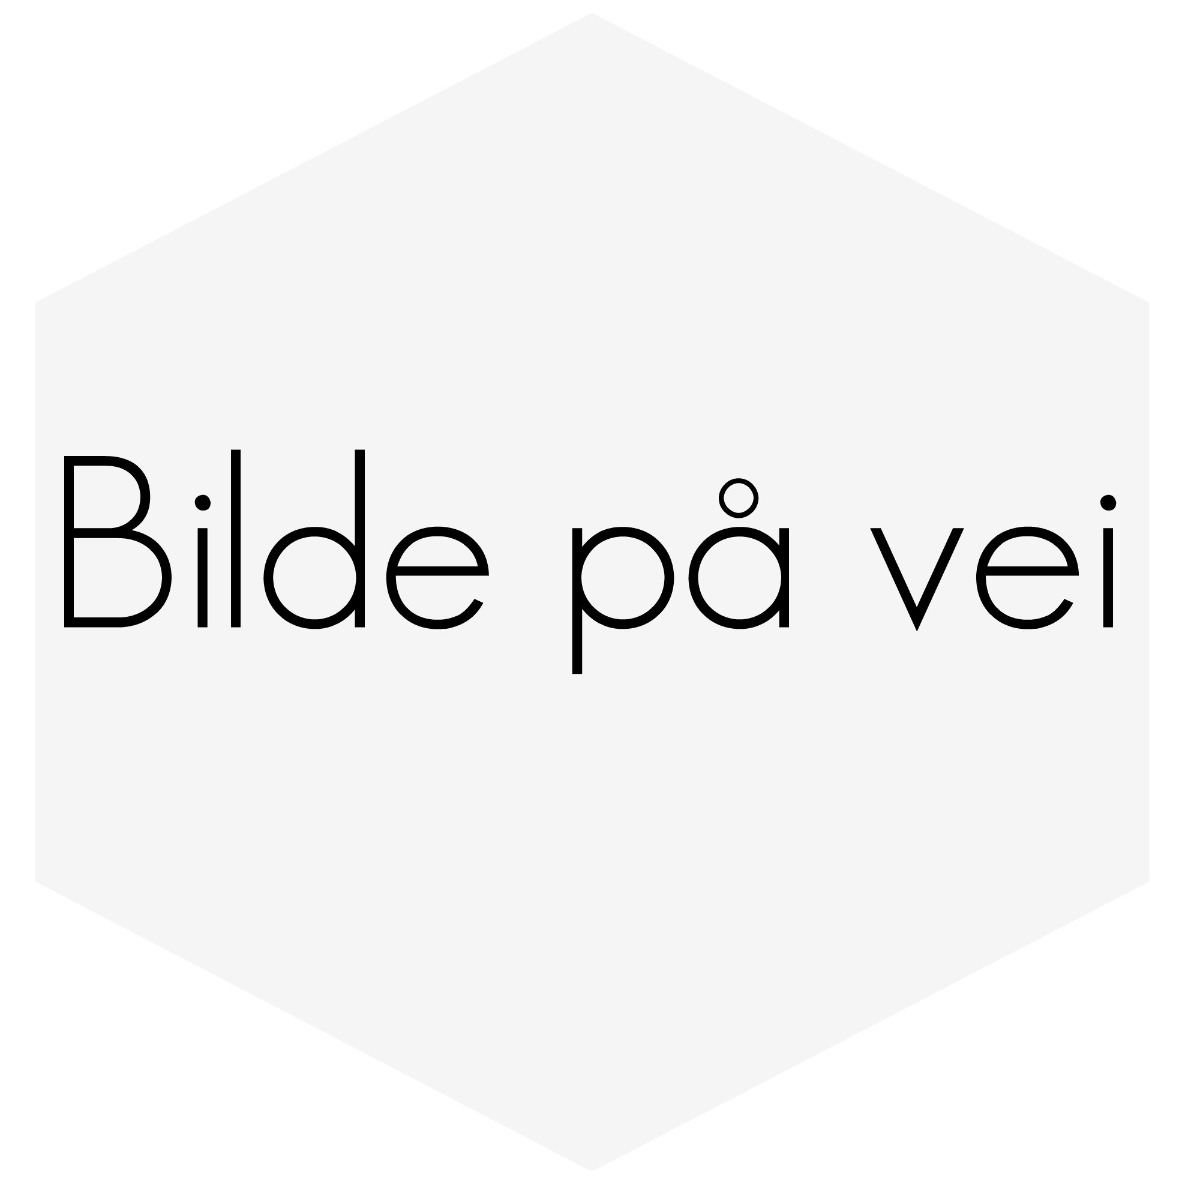 DEKK VINTER PIGG 195/65-15 VREDESTEIN WINTRAC ICE TILBUDSPRS